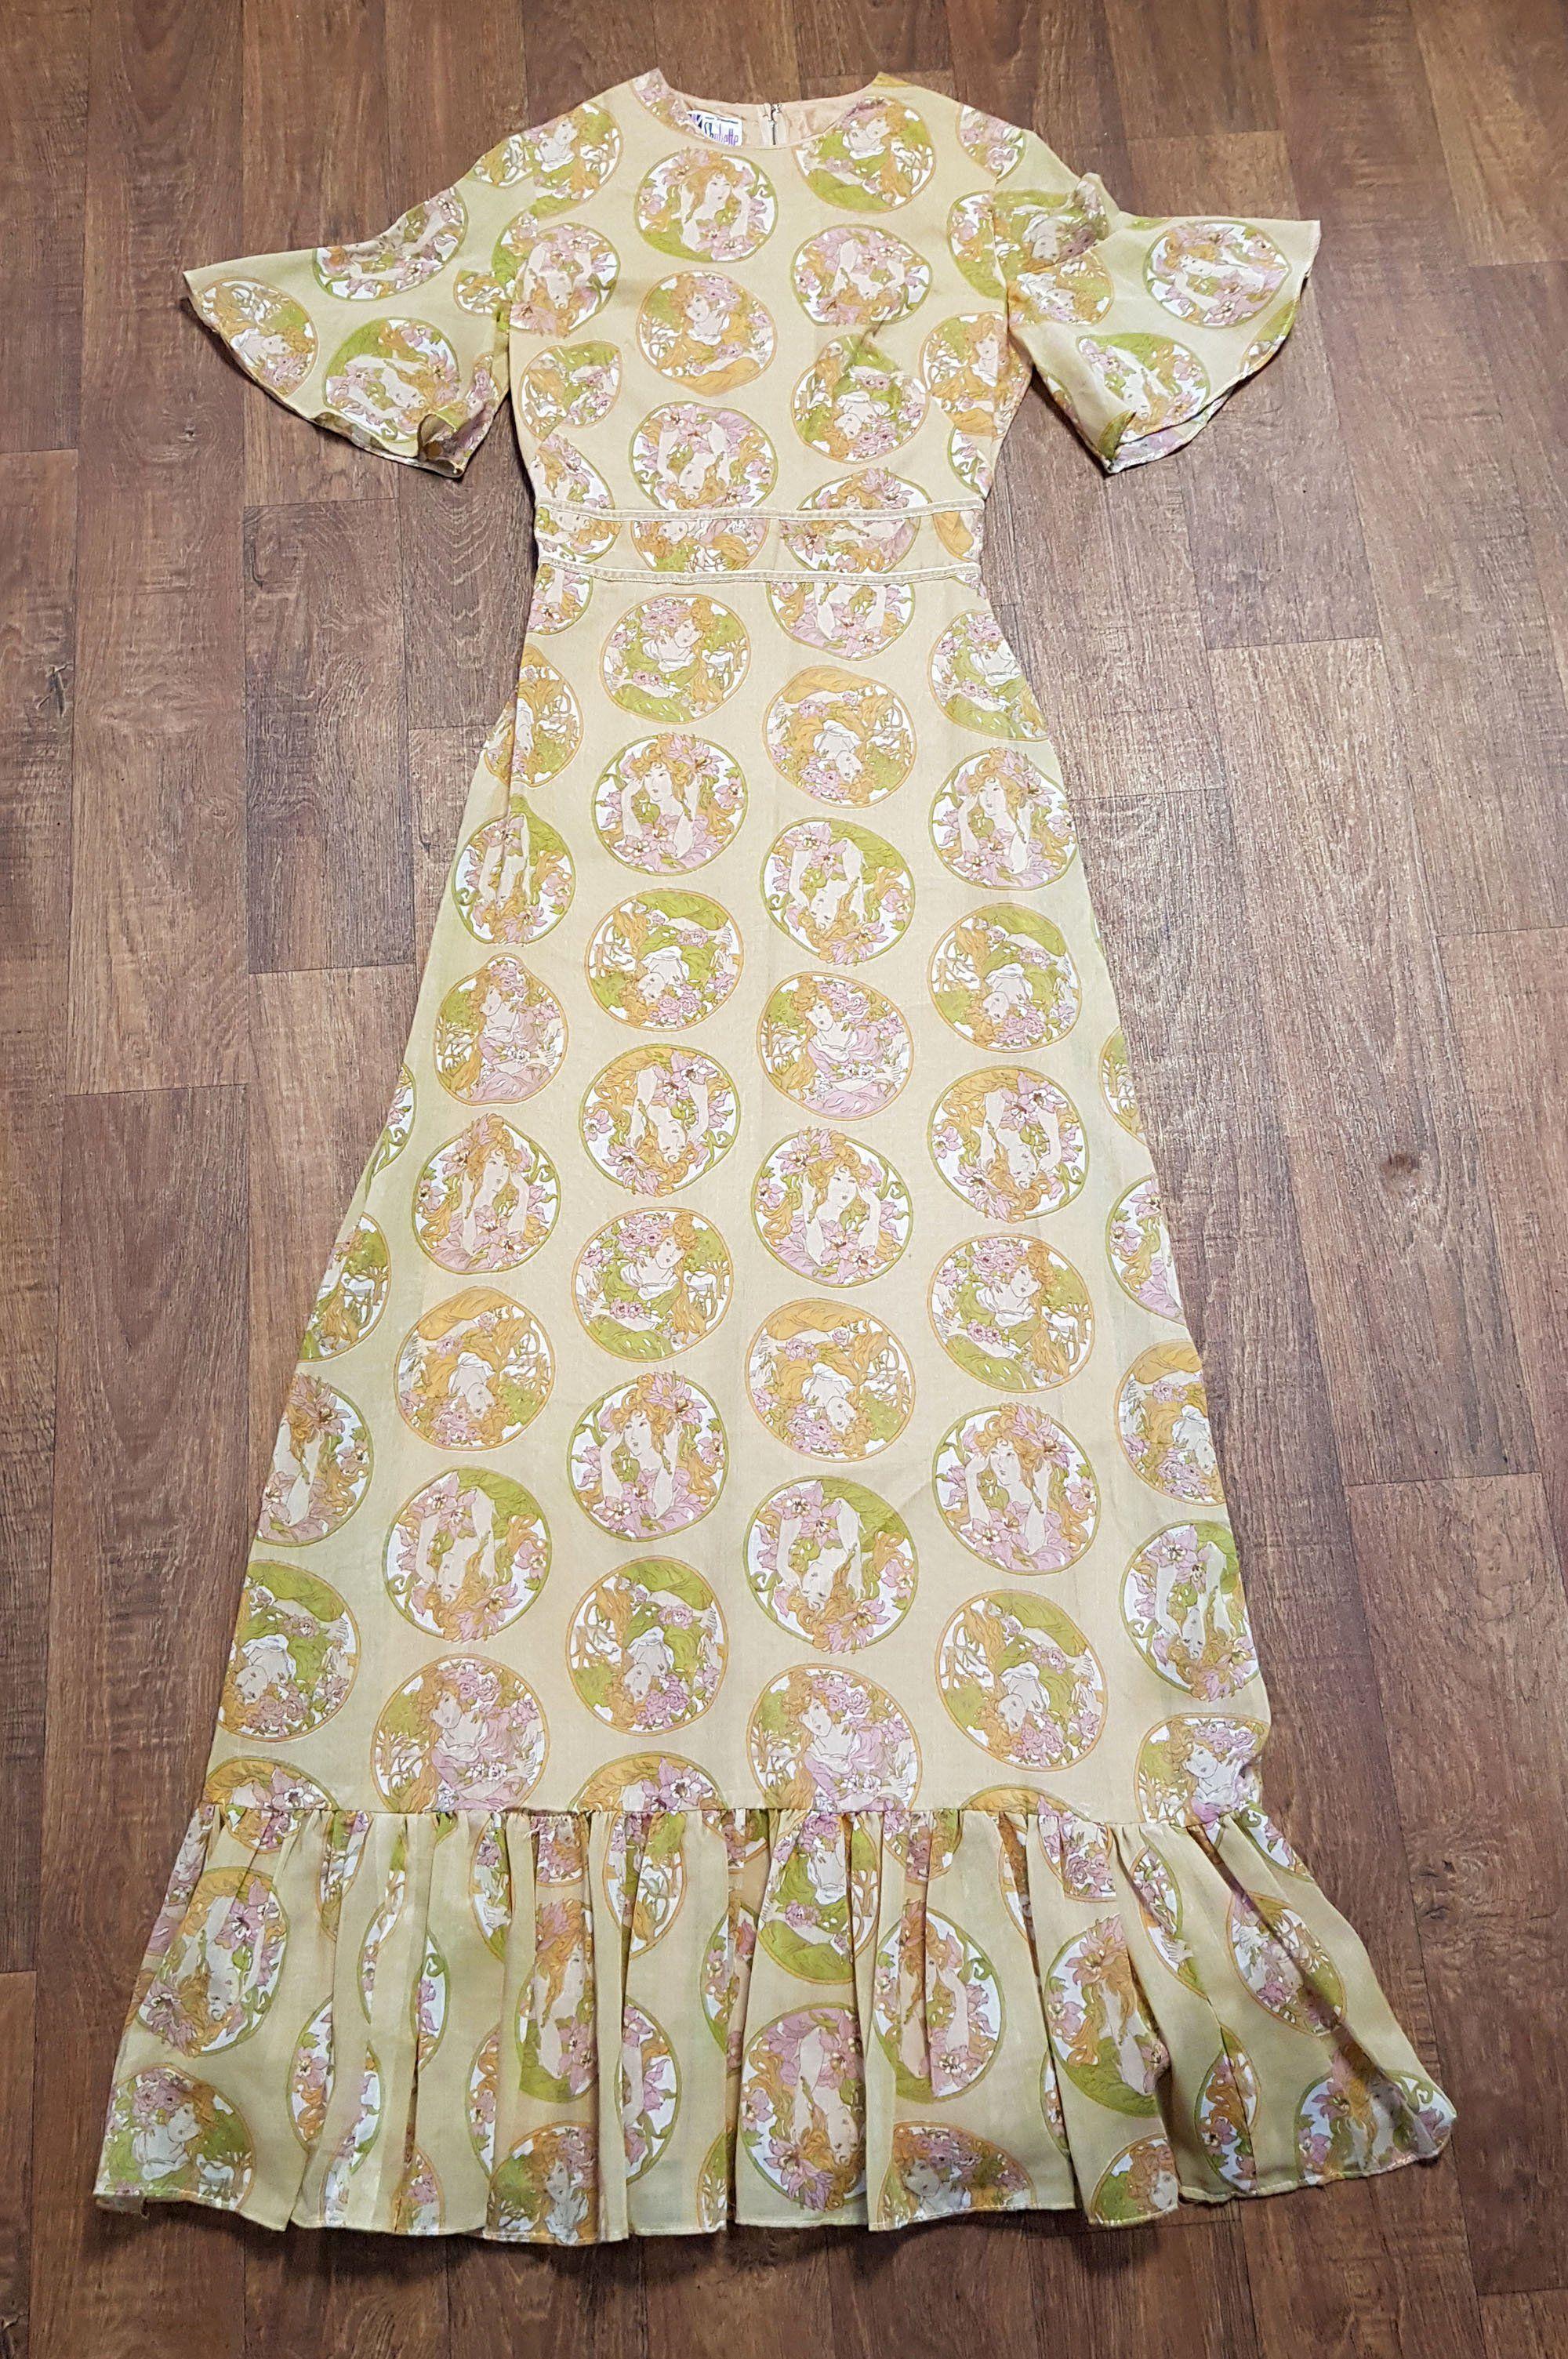 1970s Vintage Pre Raphaelite Print Maxi Dress Uk Size 8 Vintage Dresses Maxi Dresses Uk Printed Maxi Dress Vintage Dresses [ 3009 x 2000 Pixel ]